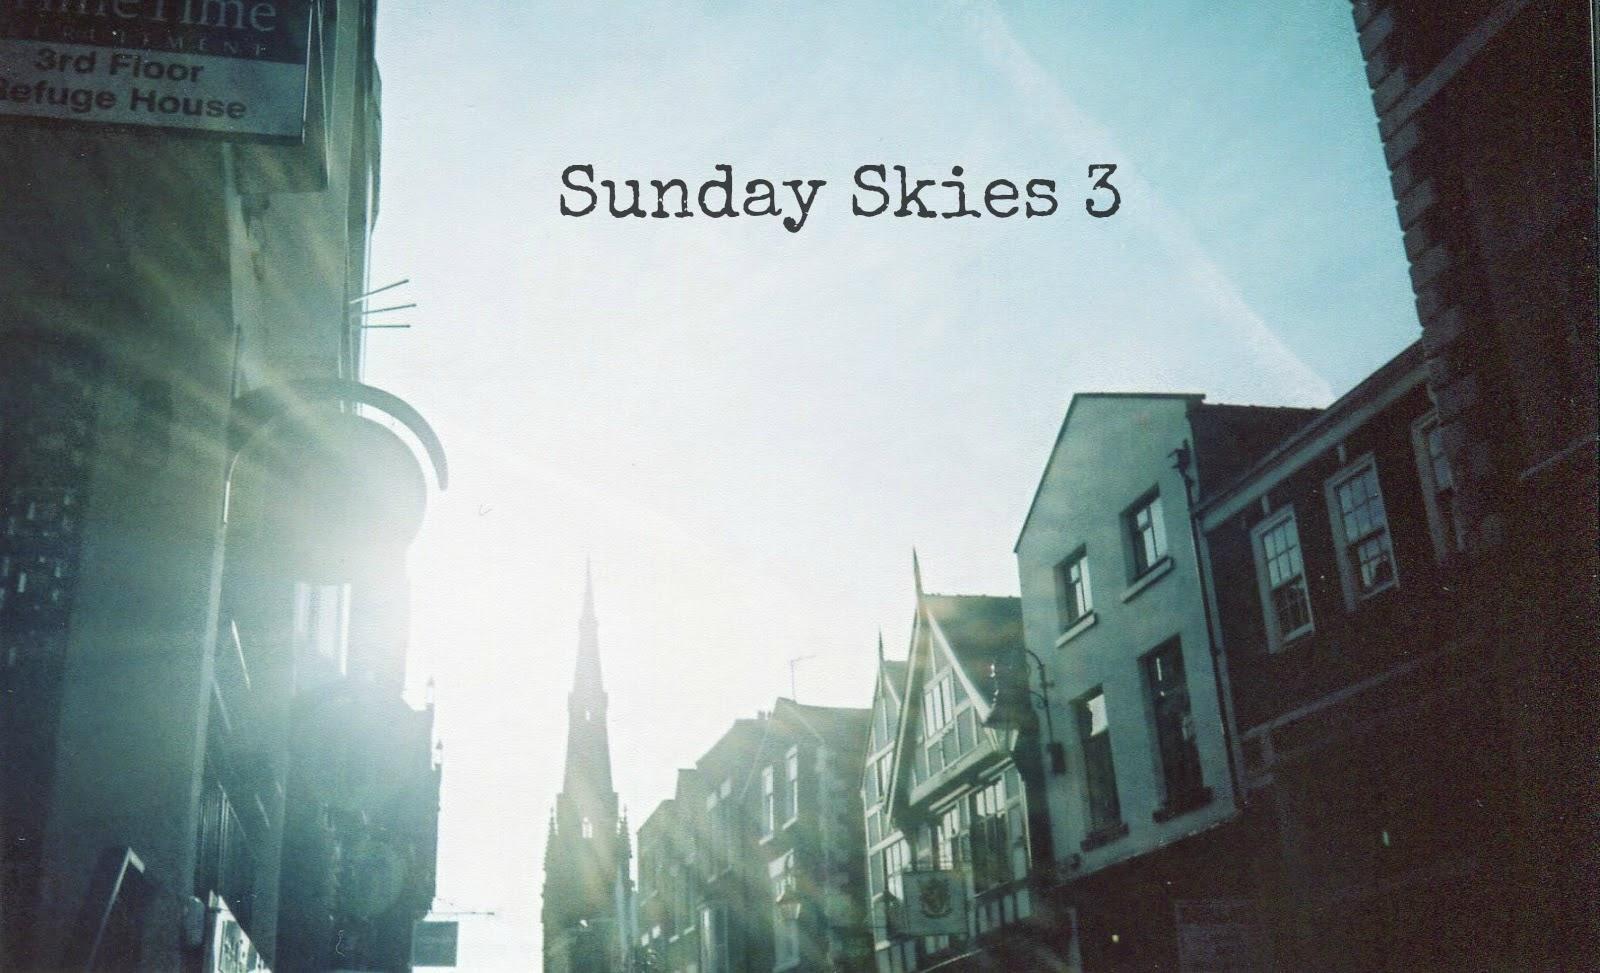 http://talesonfilm.blogspot.co.uk/2014/04/sunday-skies.html